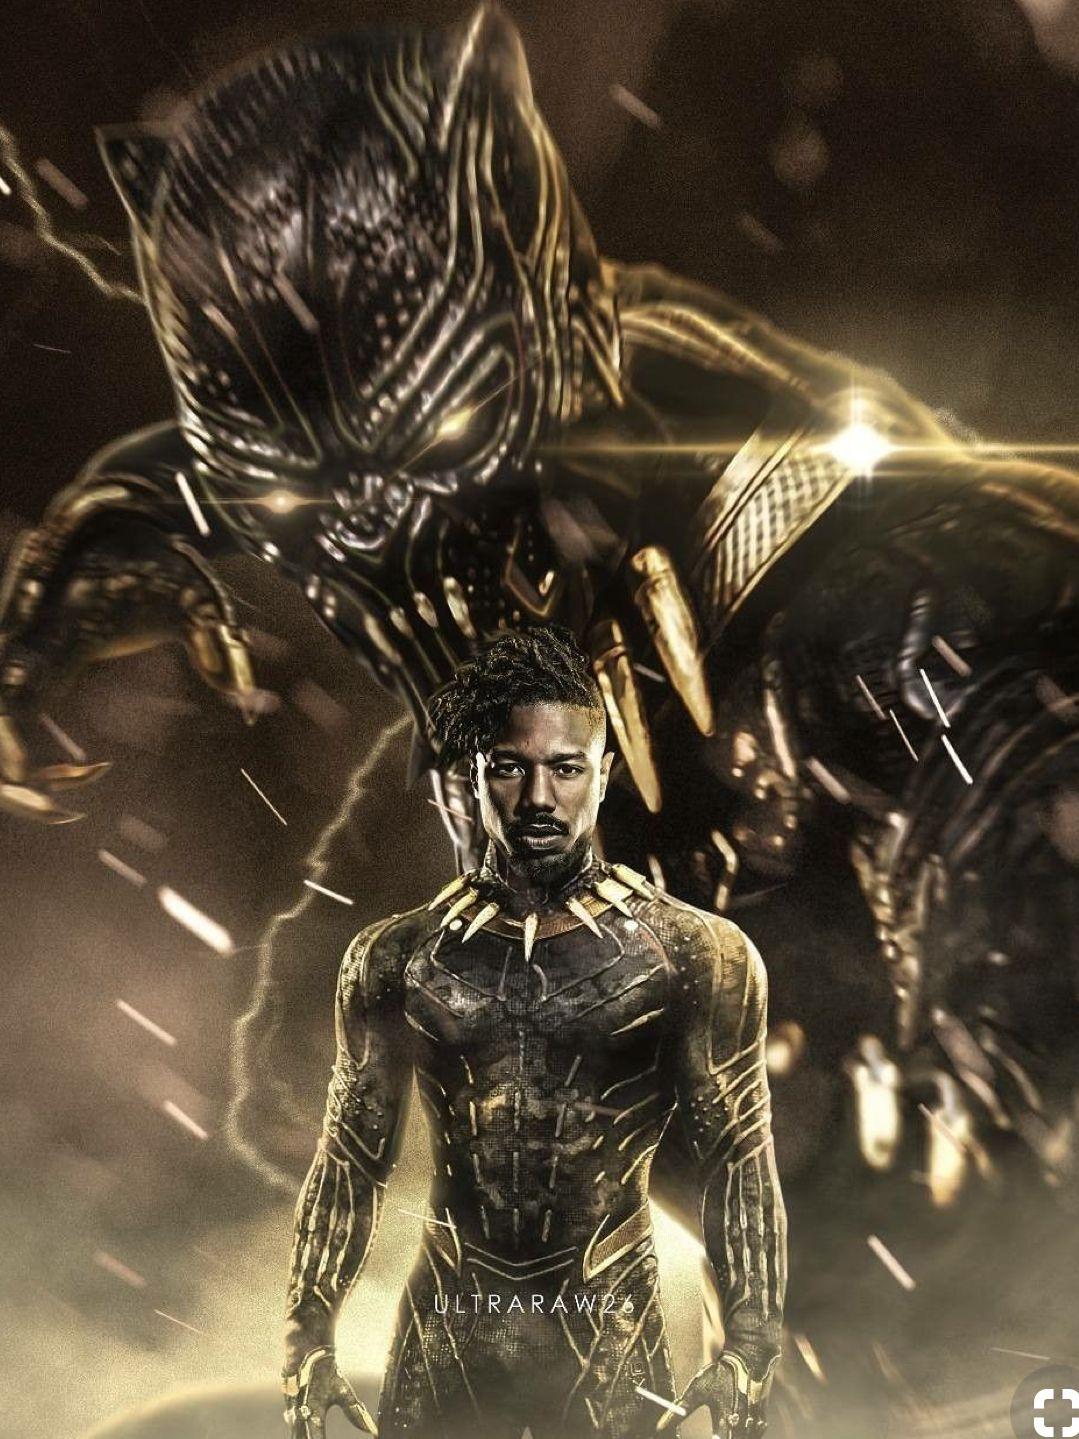 Micgael B Jordan As Erik Killmonger Is One Of The Best Mcu Villains Black Panther Art Black Panther Marvel Black Comics